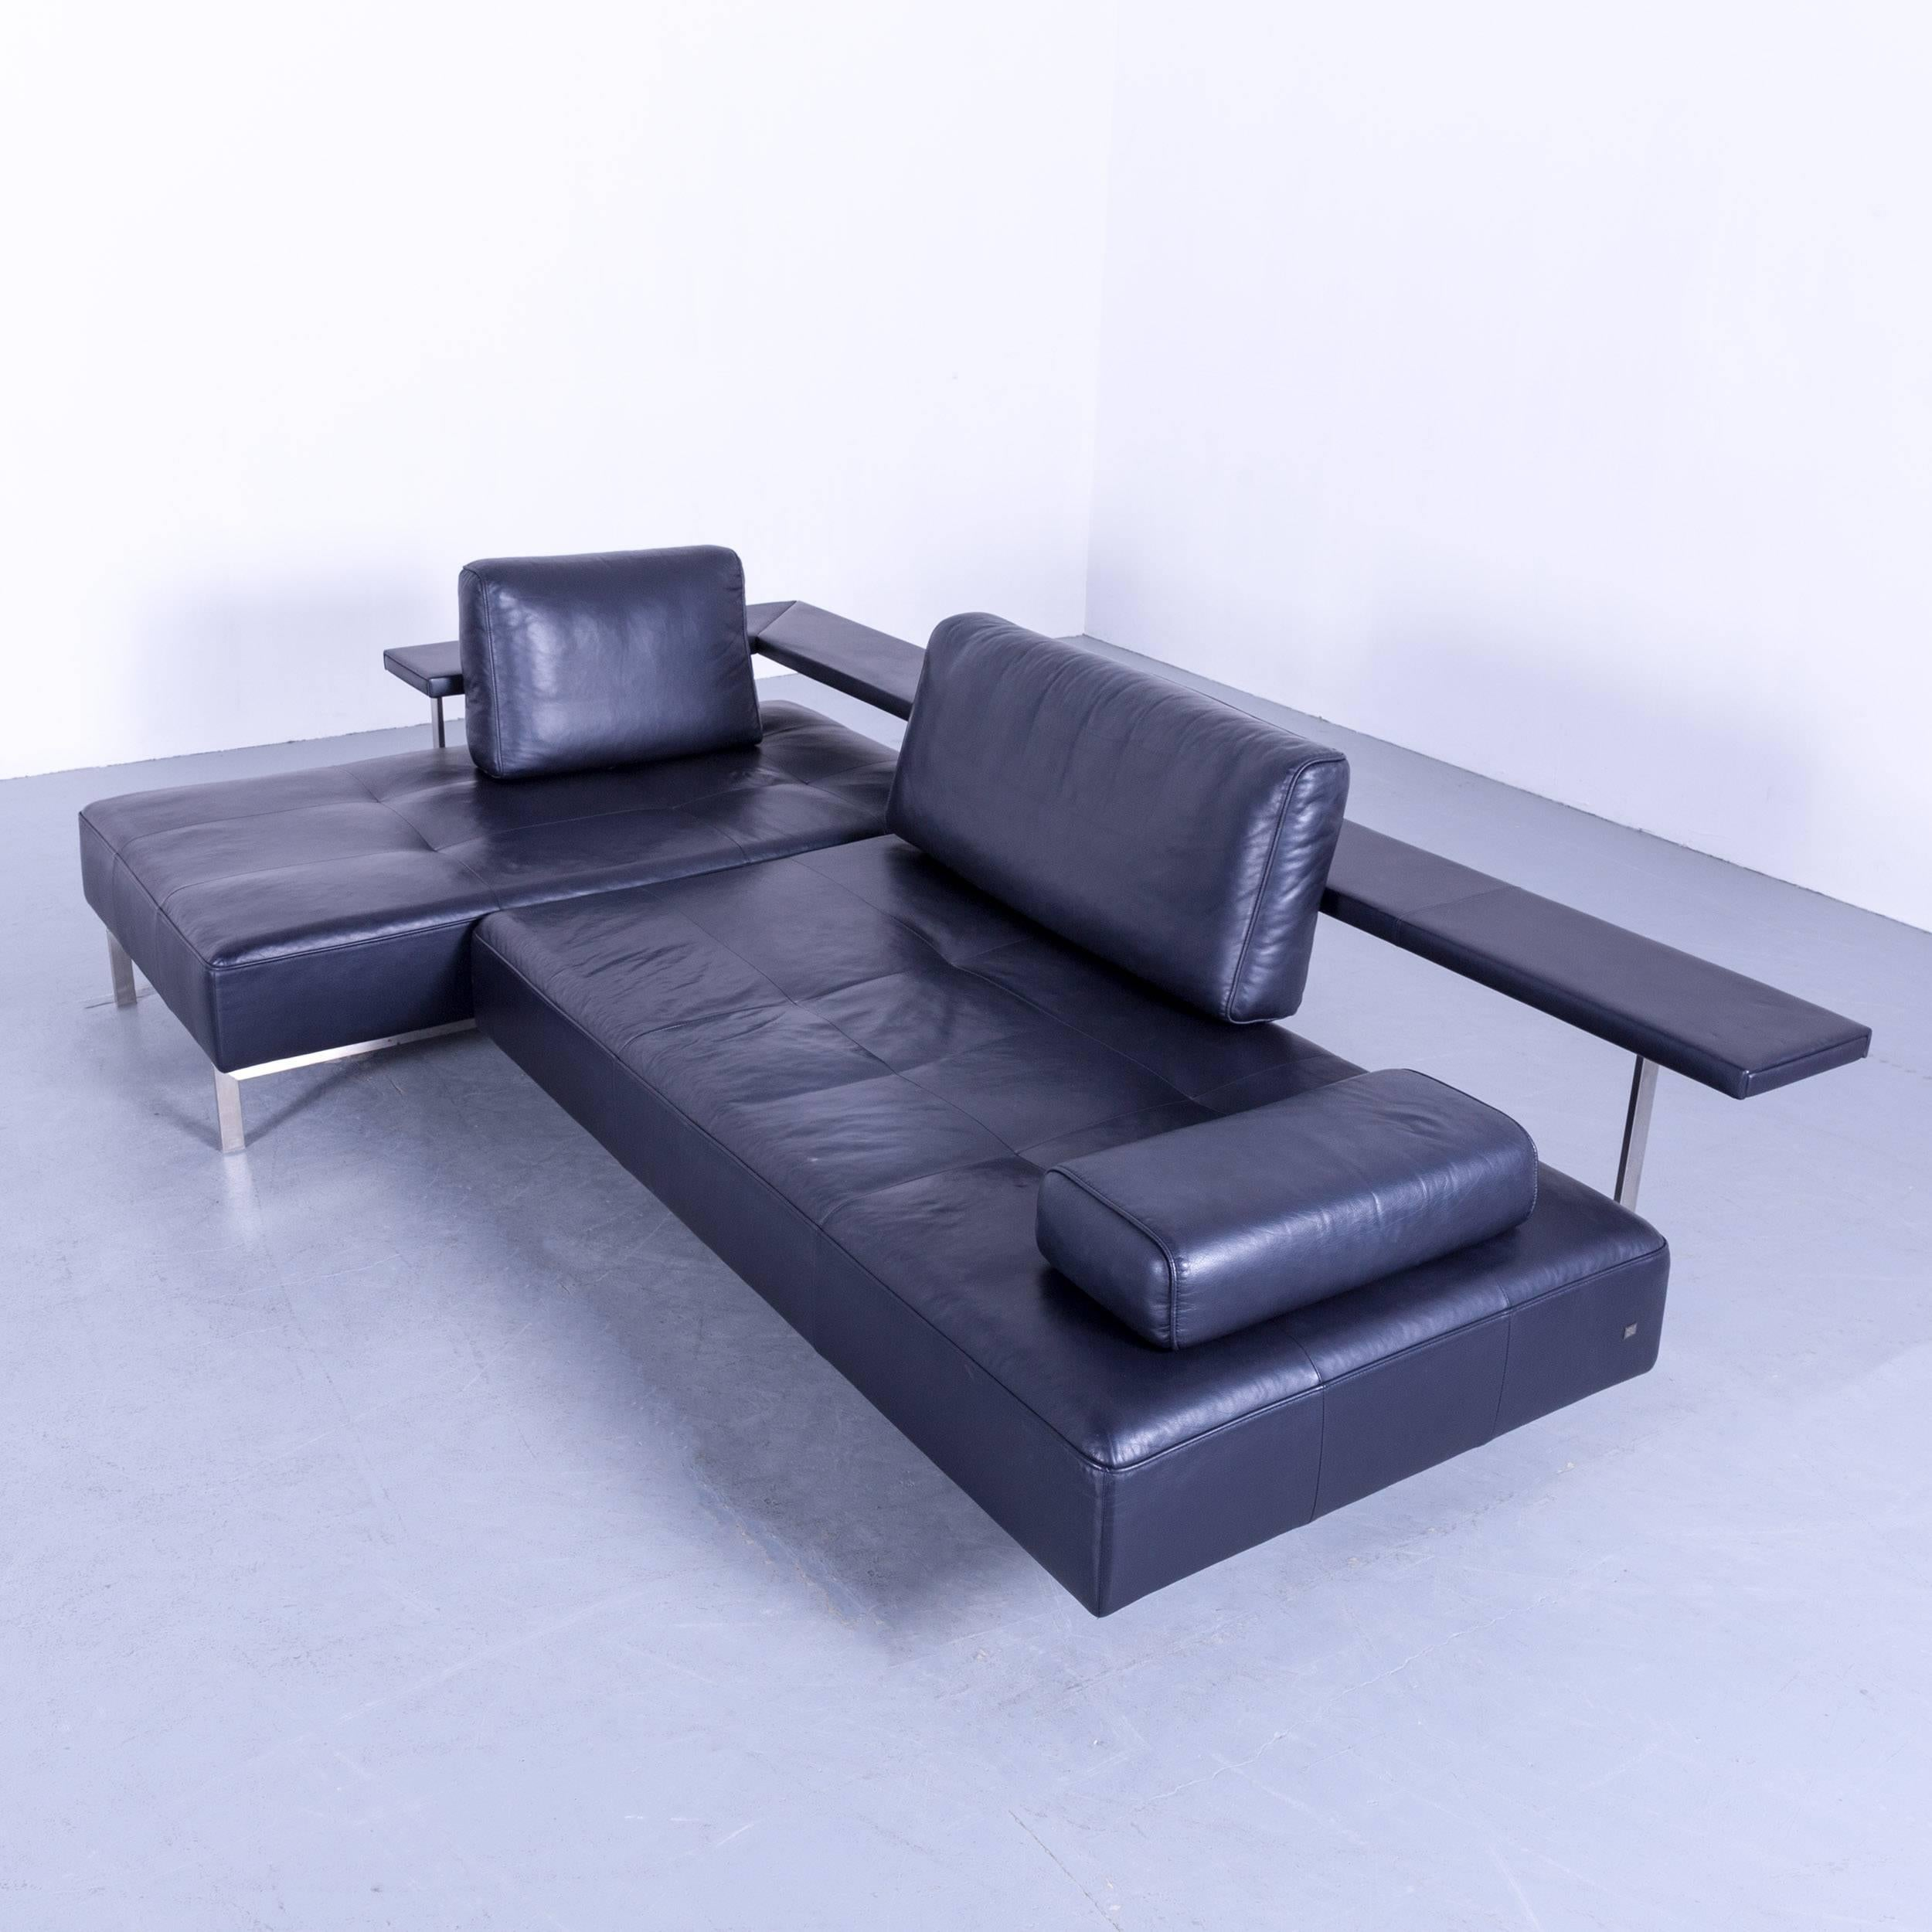 German Rolf Benz Dono Designer Corner Sofa Leather Navy Blue Dark Blue Sleeping  Couch For Sale